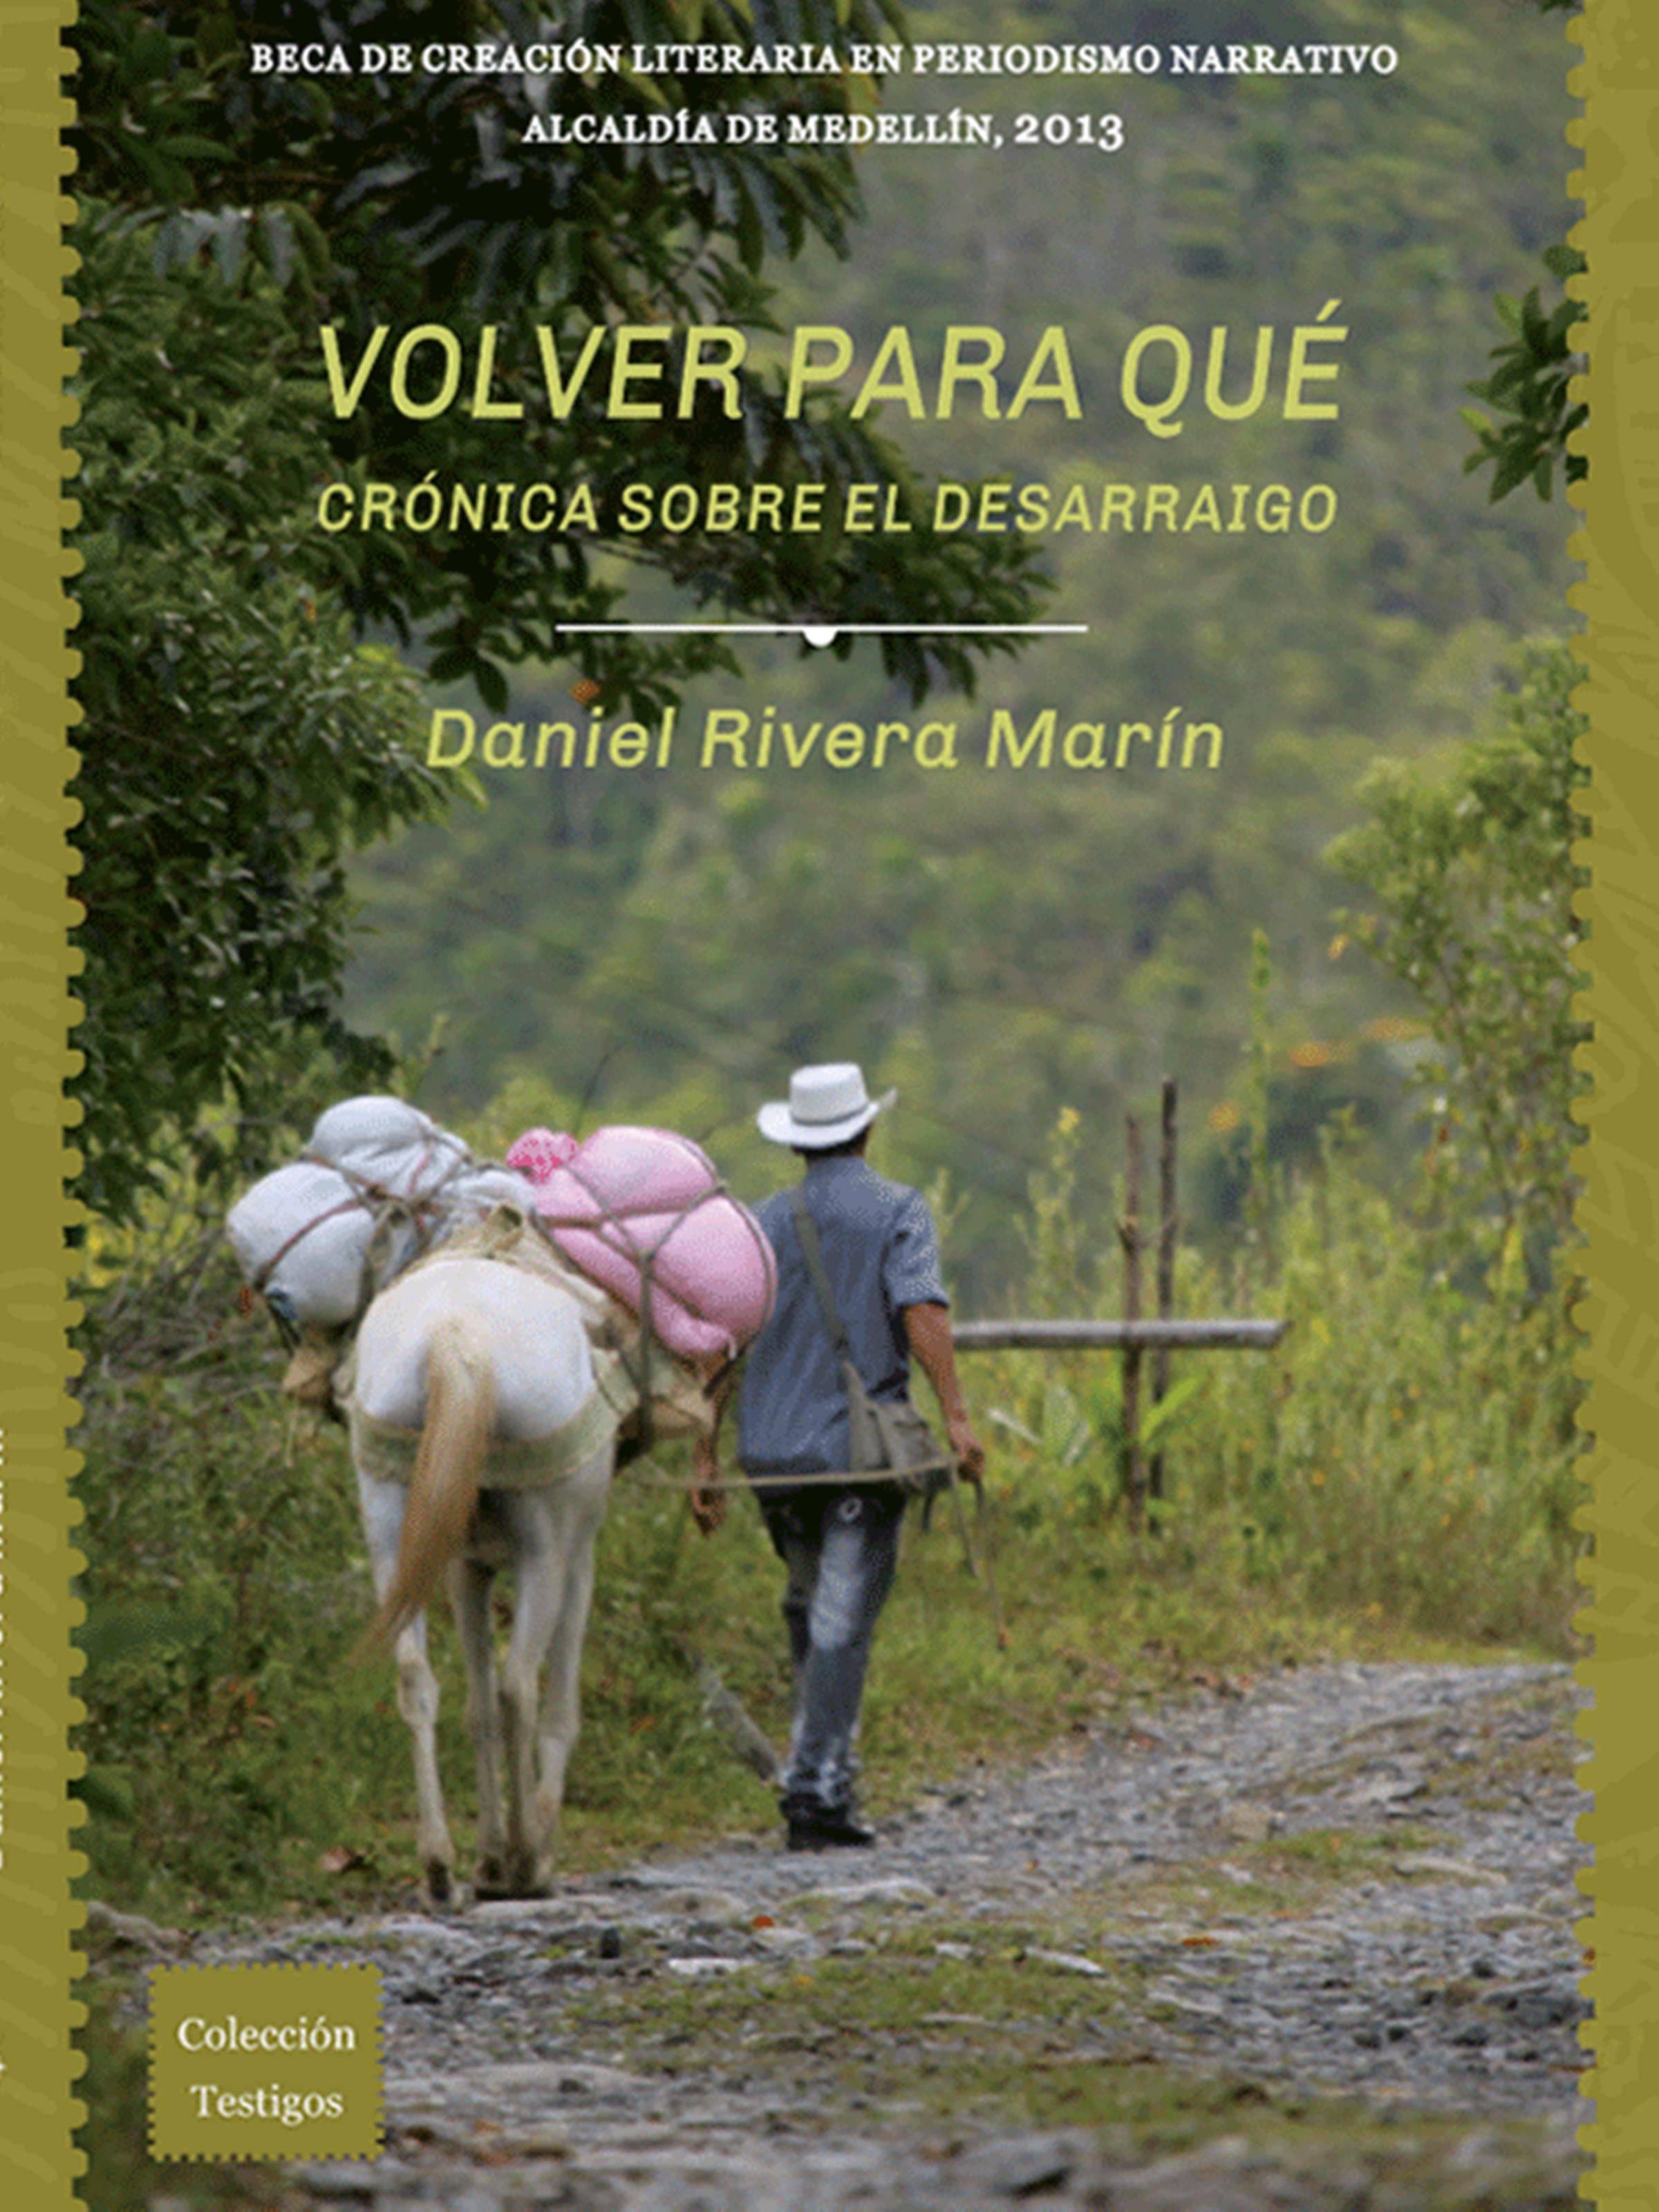 цена на Daniel Rivera Marín Volver para qué